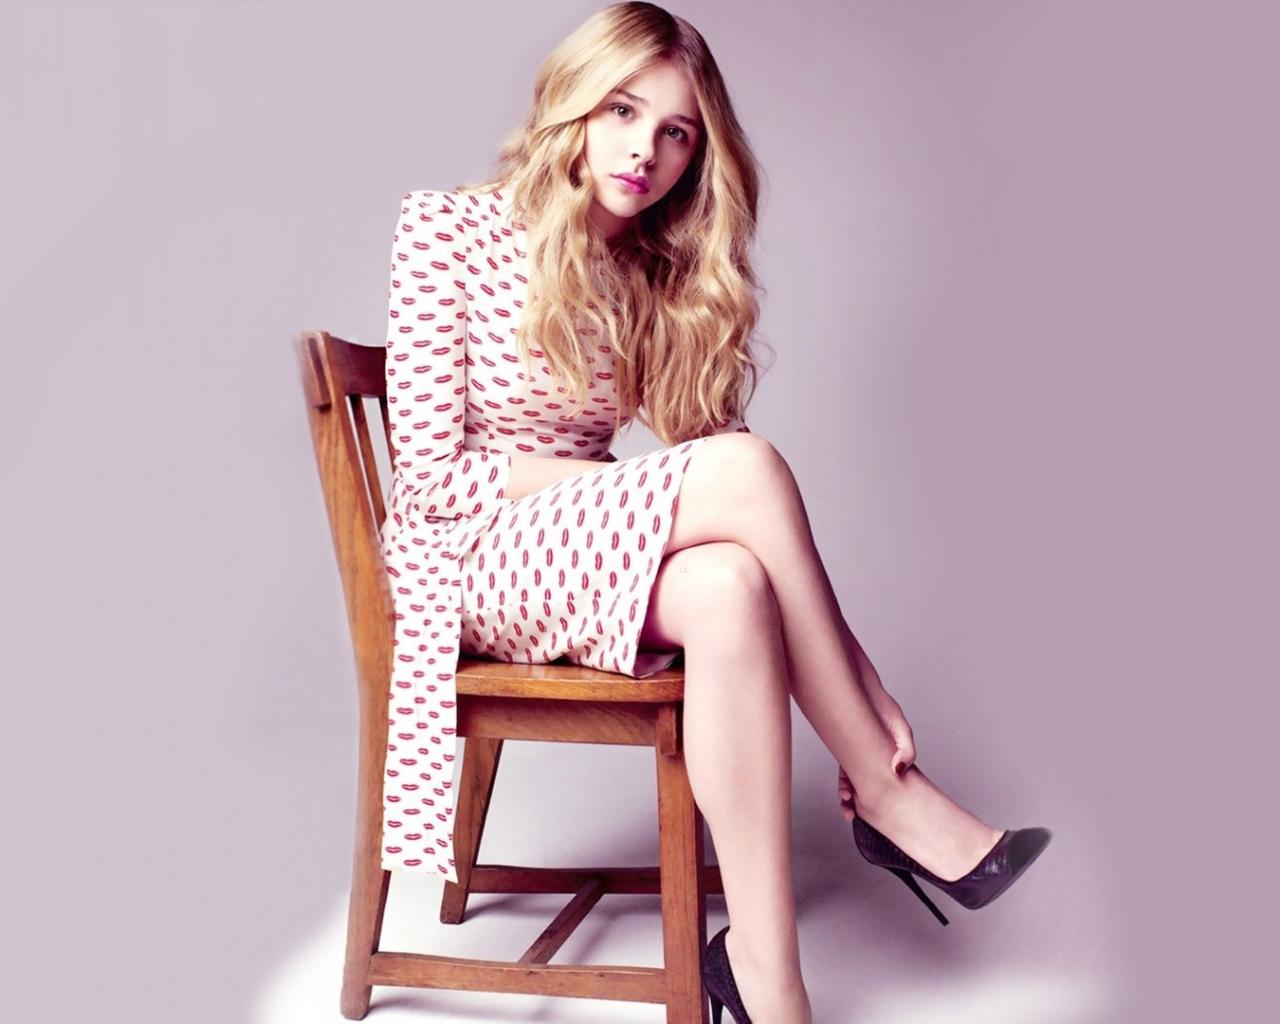 Chloe Grace Moretz, sit, celebrity, 1280x1024 wallpaper